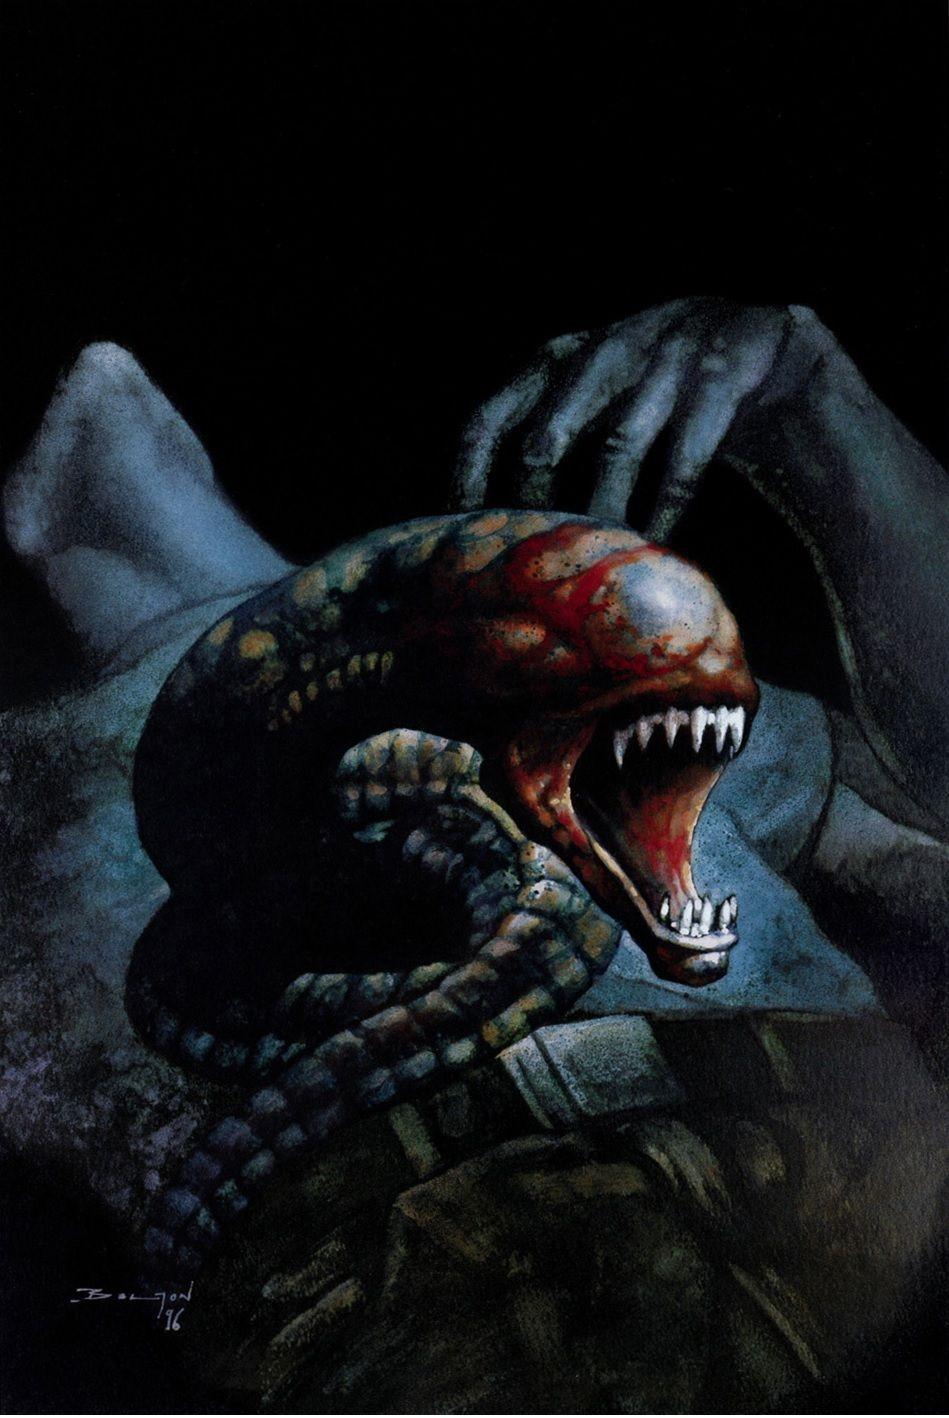 Pin on Alien and Predator